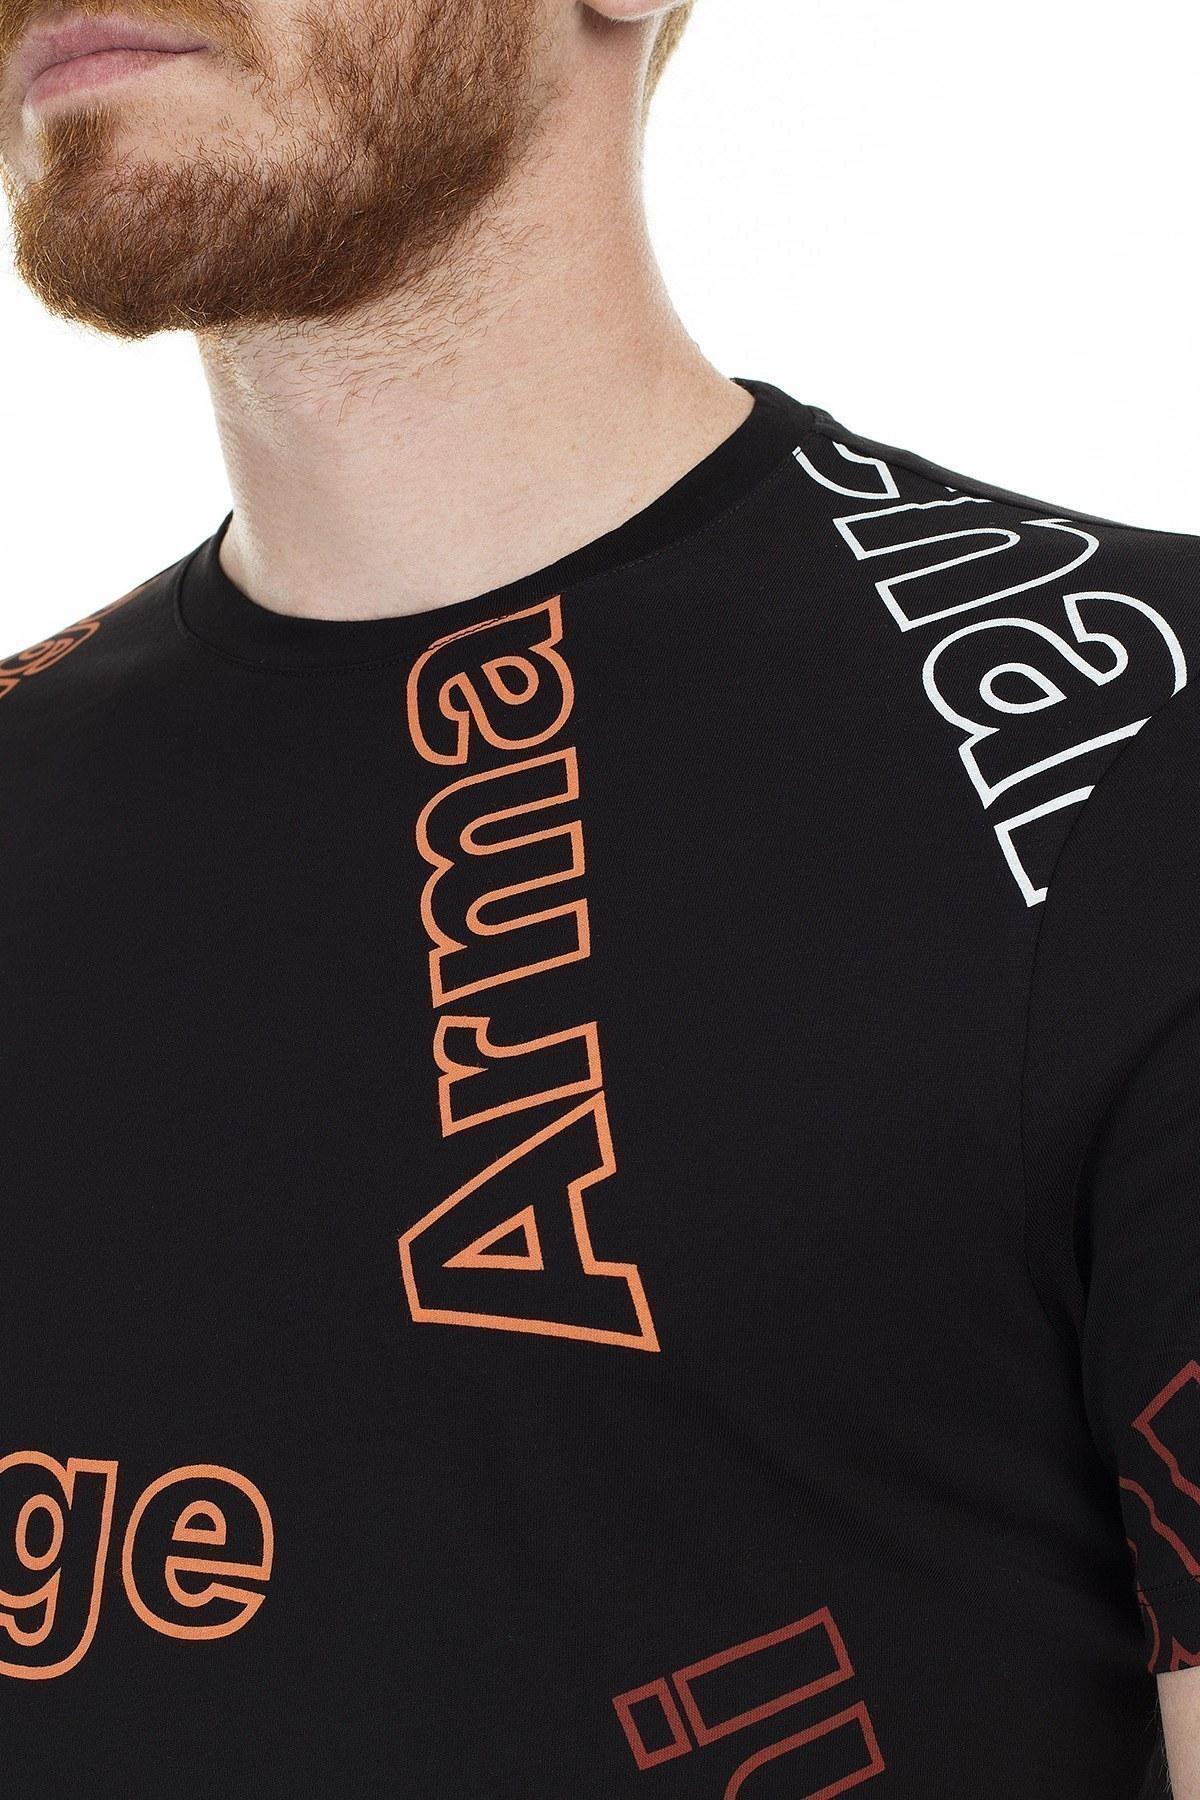 Armani Exchange Baskılı Bisiklet Yaka Erkek T Shirt 3HZTFC ZJH4Z 6260 SİYAH